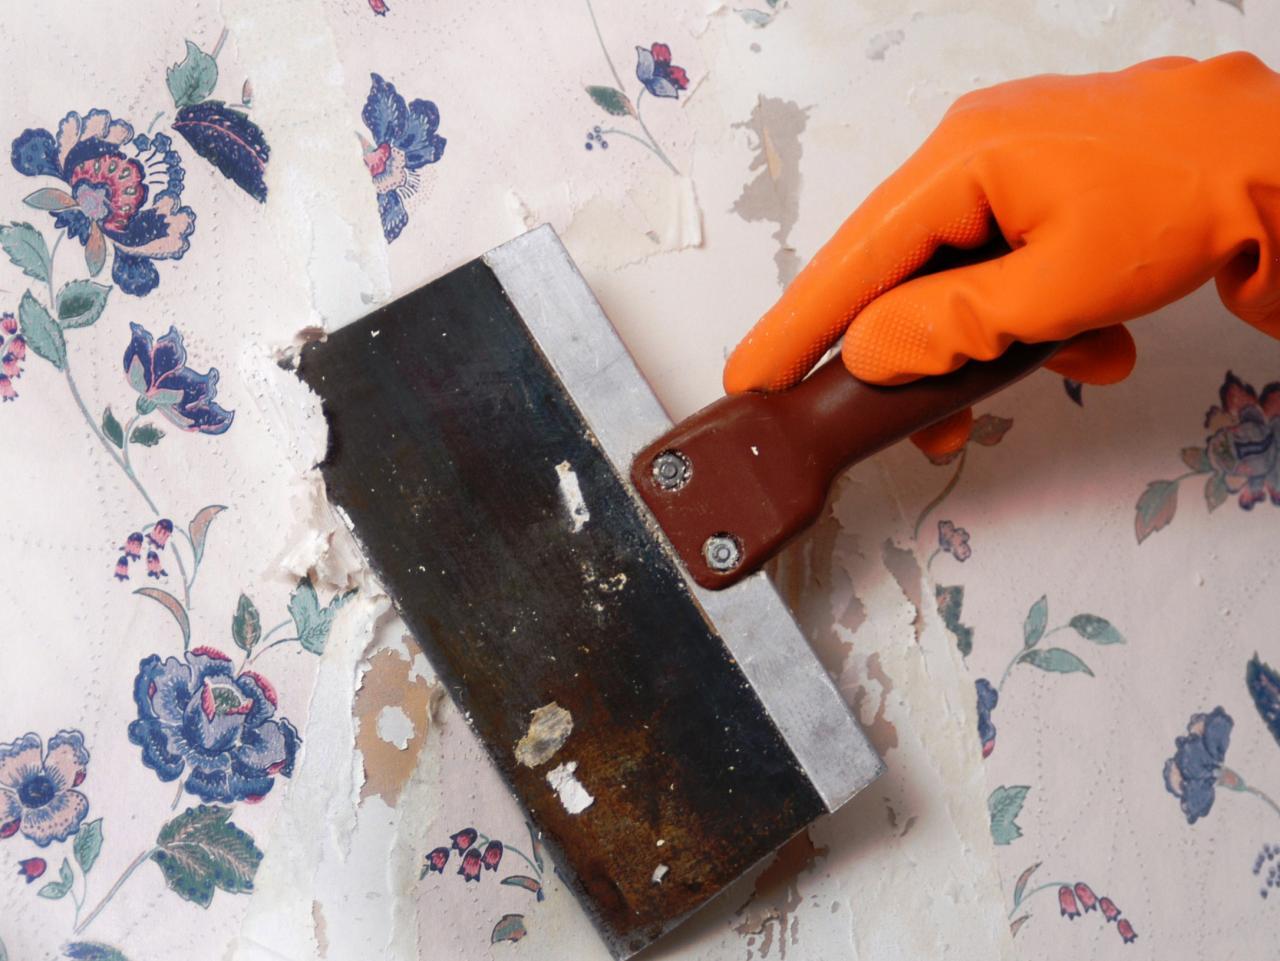 UHT Wallpaper Removal scraping wallpaper s4x3jpgrendhgtvcom1280 1280x960